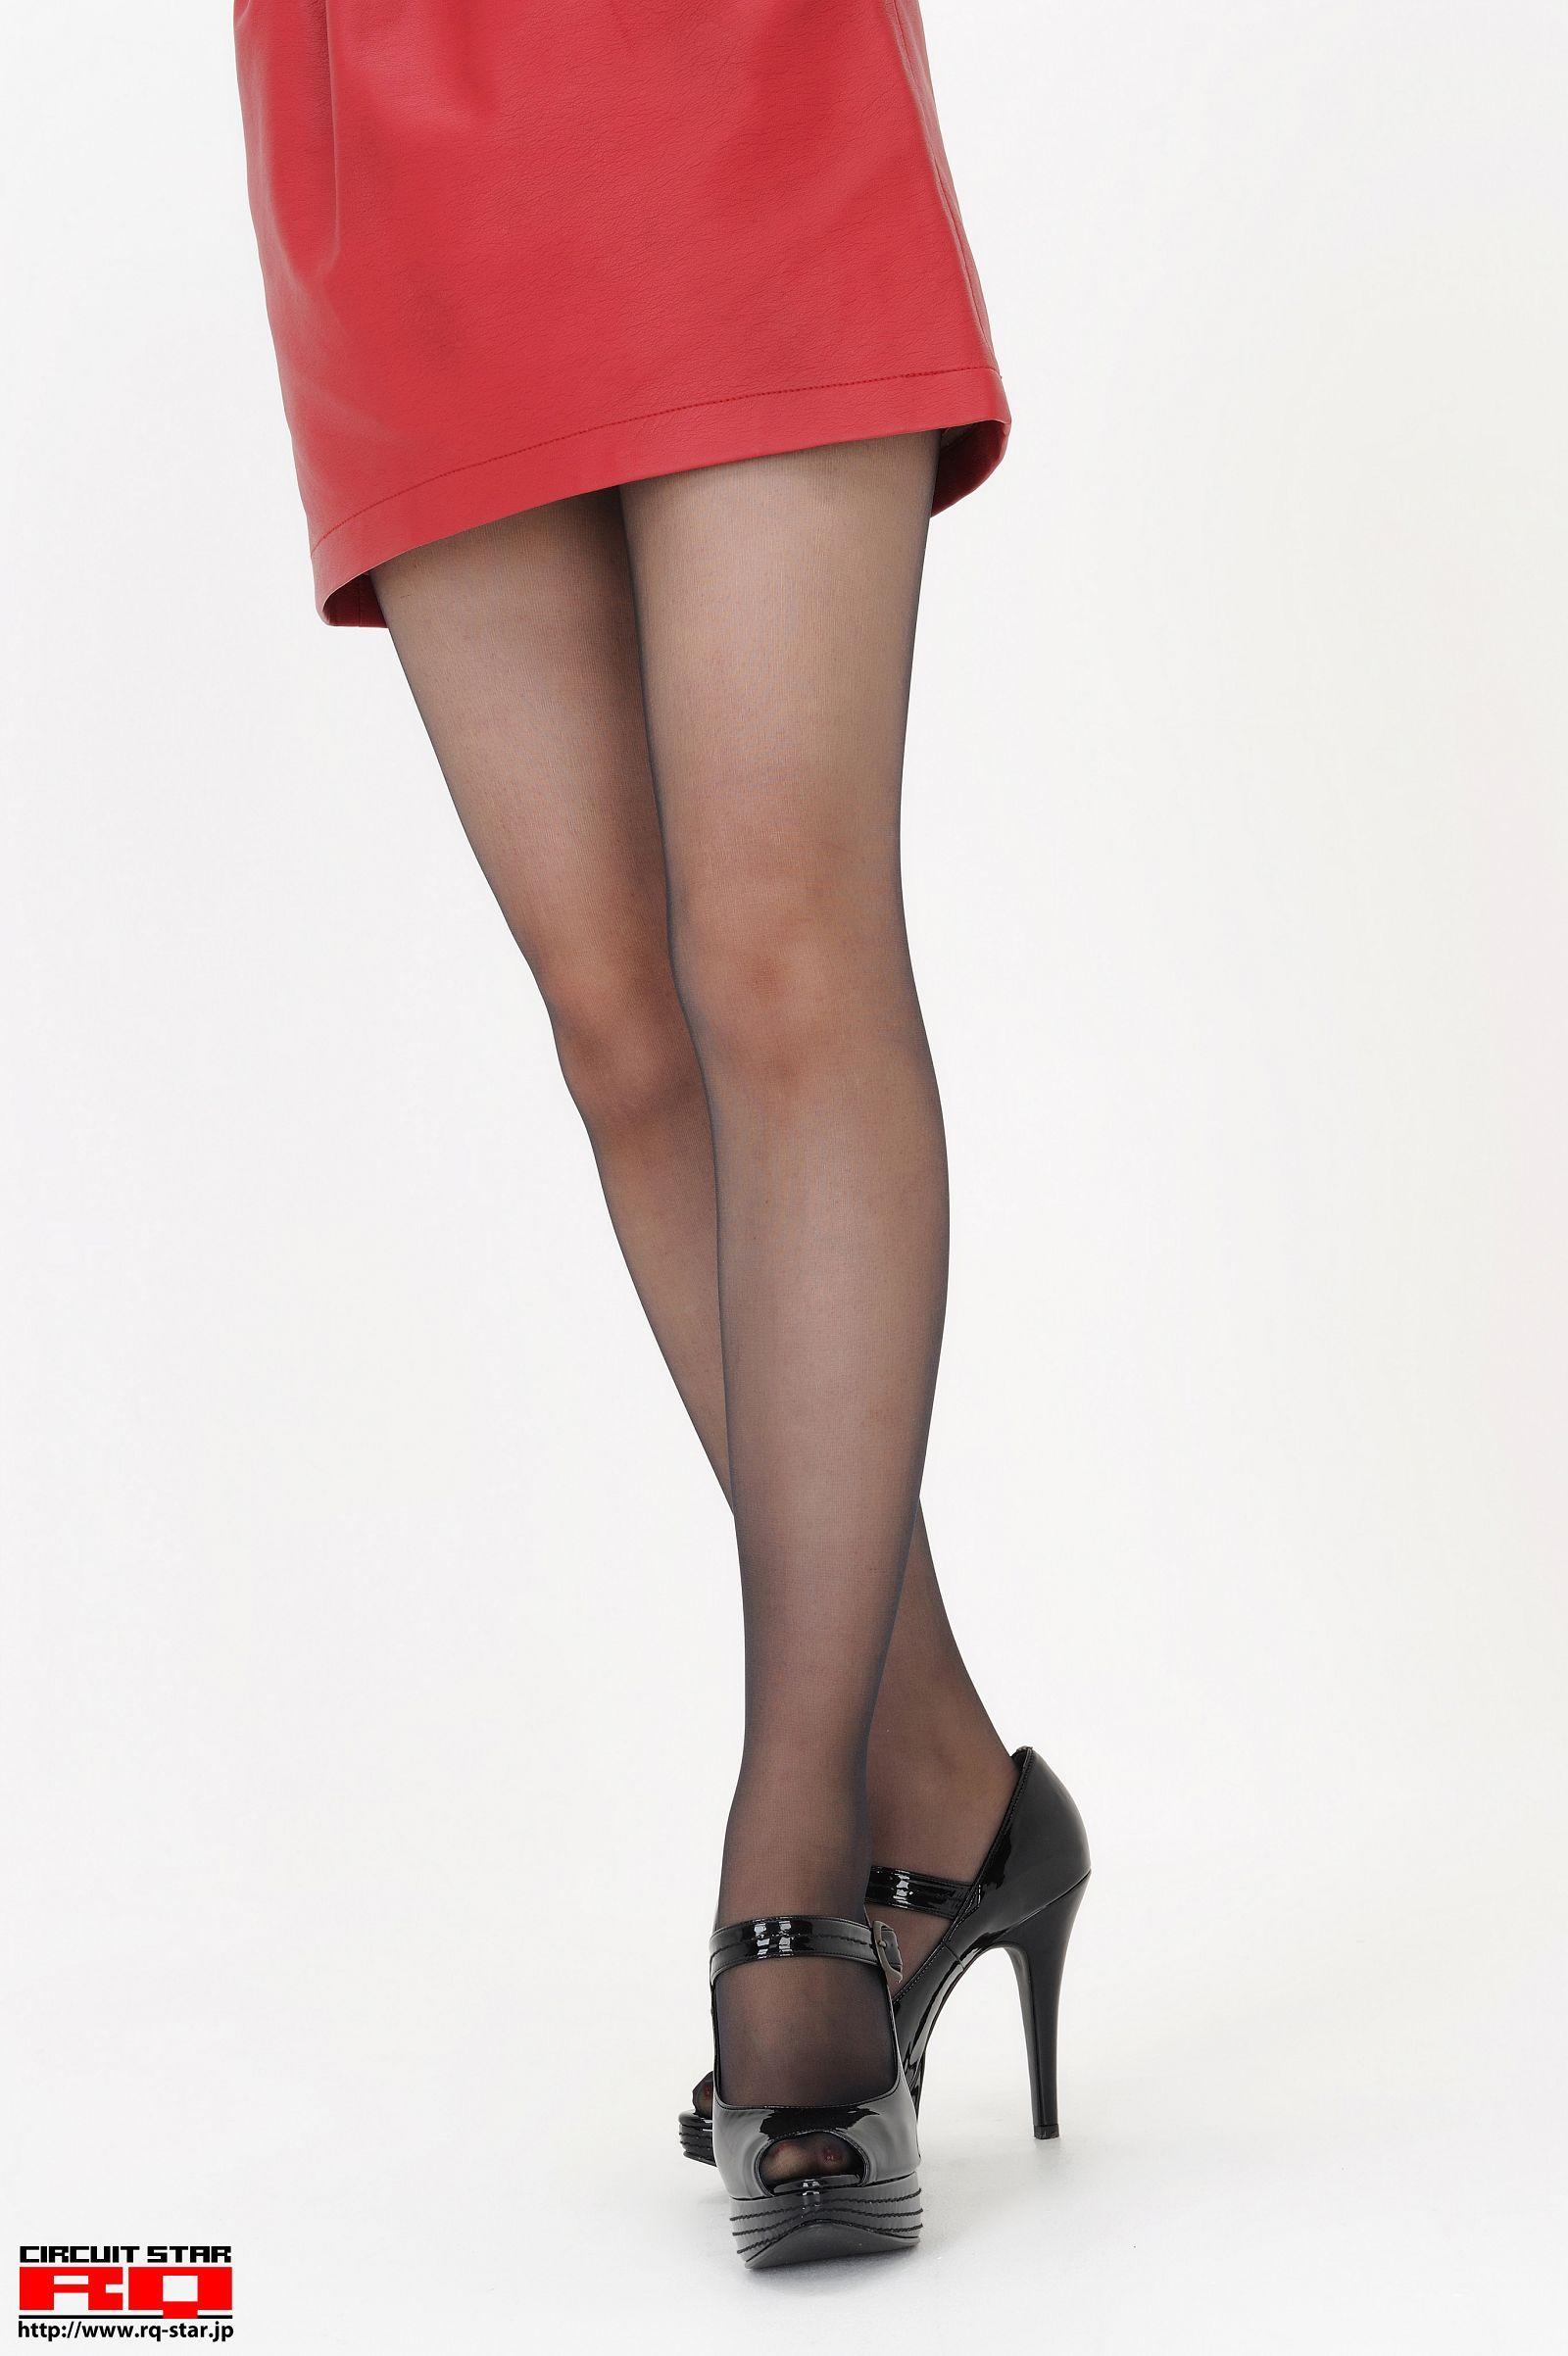 [RQ STAR美女] NO.00479 Yukina Masaki 真先由紀奈 Private Dress[110P] RQ STAR 第2张